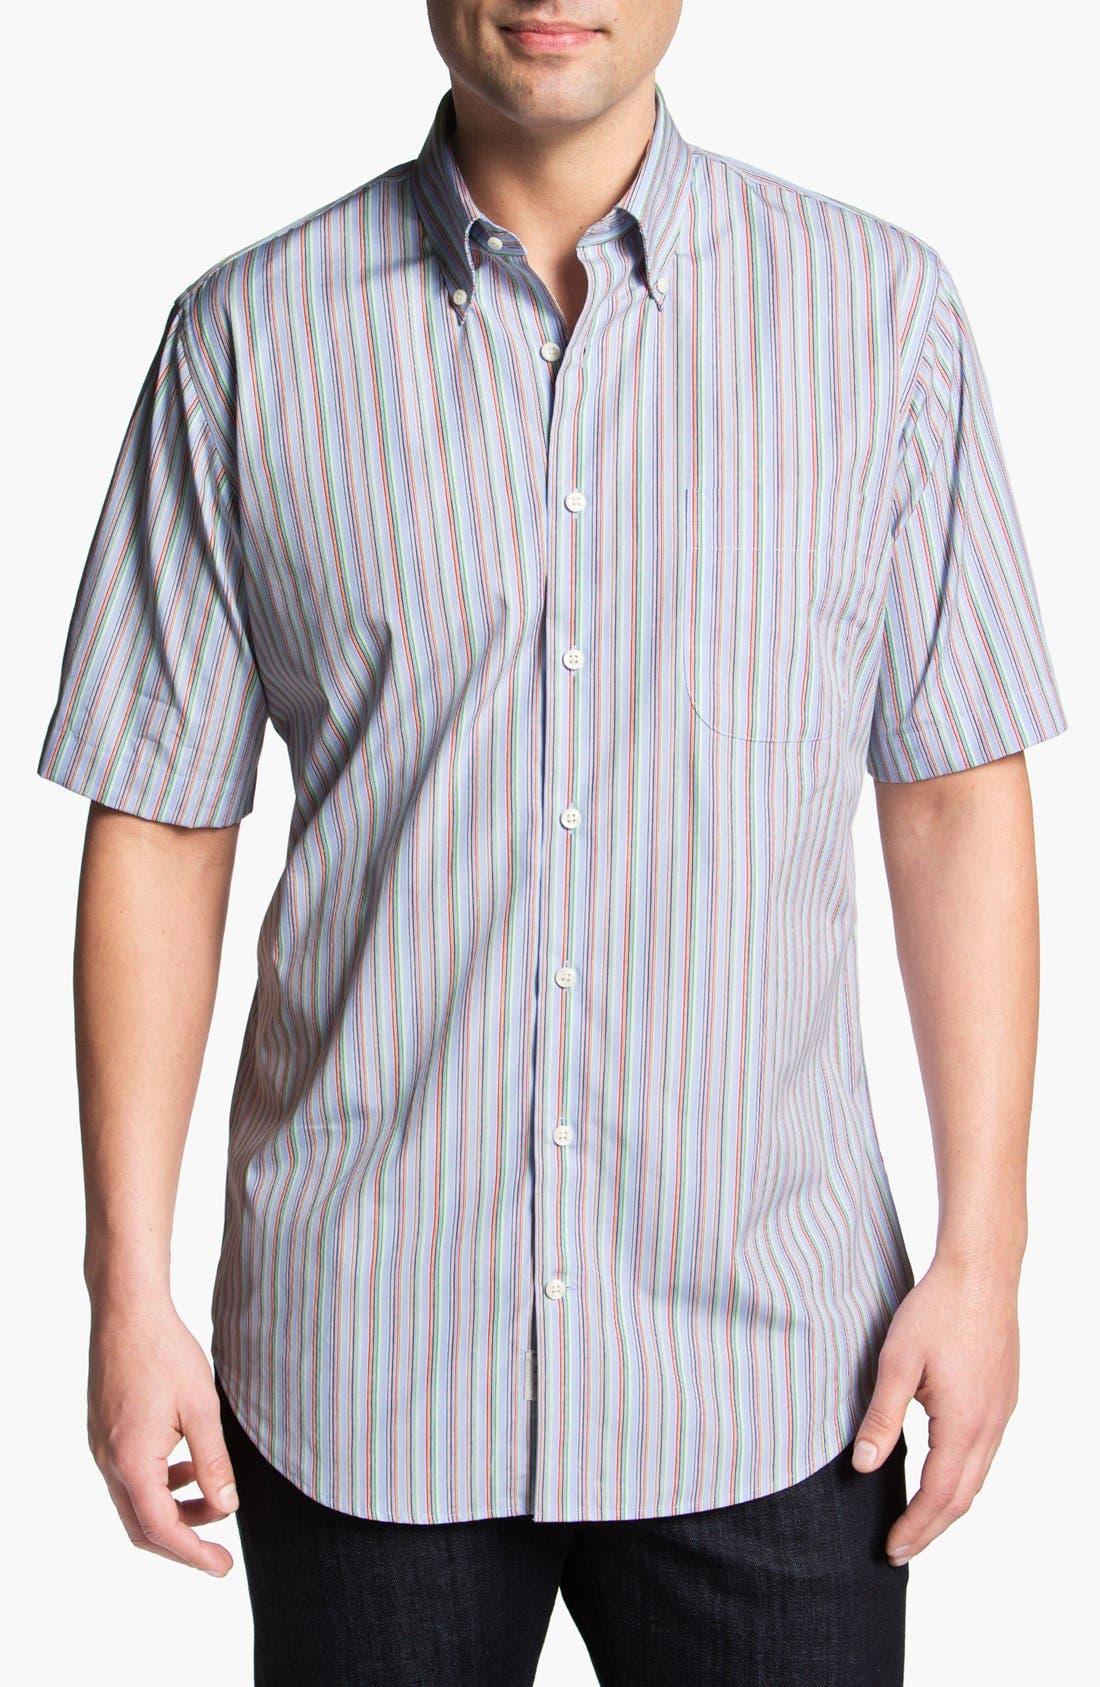 Alternate Image 1 Selected - Peter Millar 'Pop' Regular Fit Short Sleeve Sport Shirt